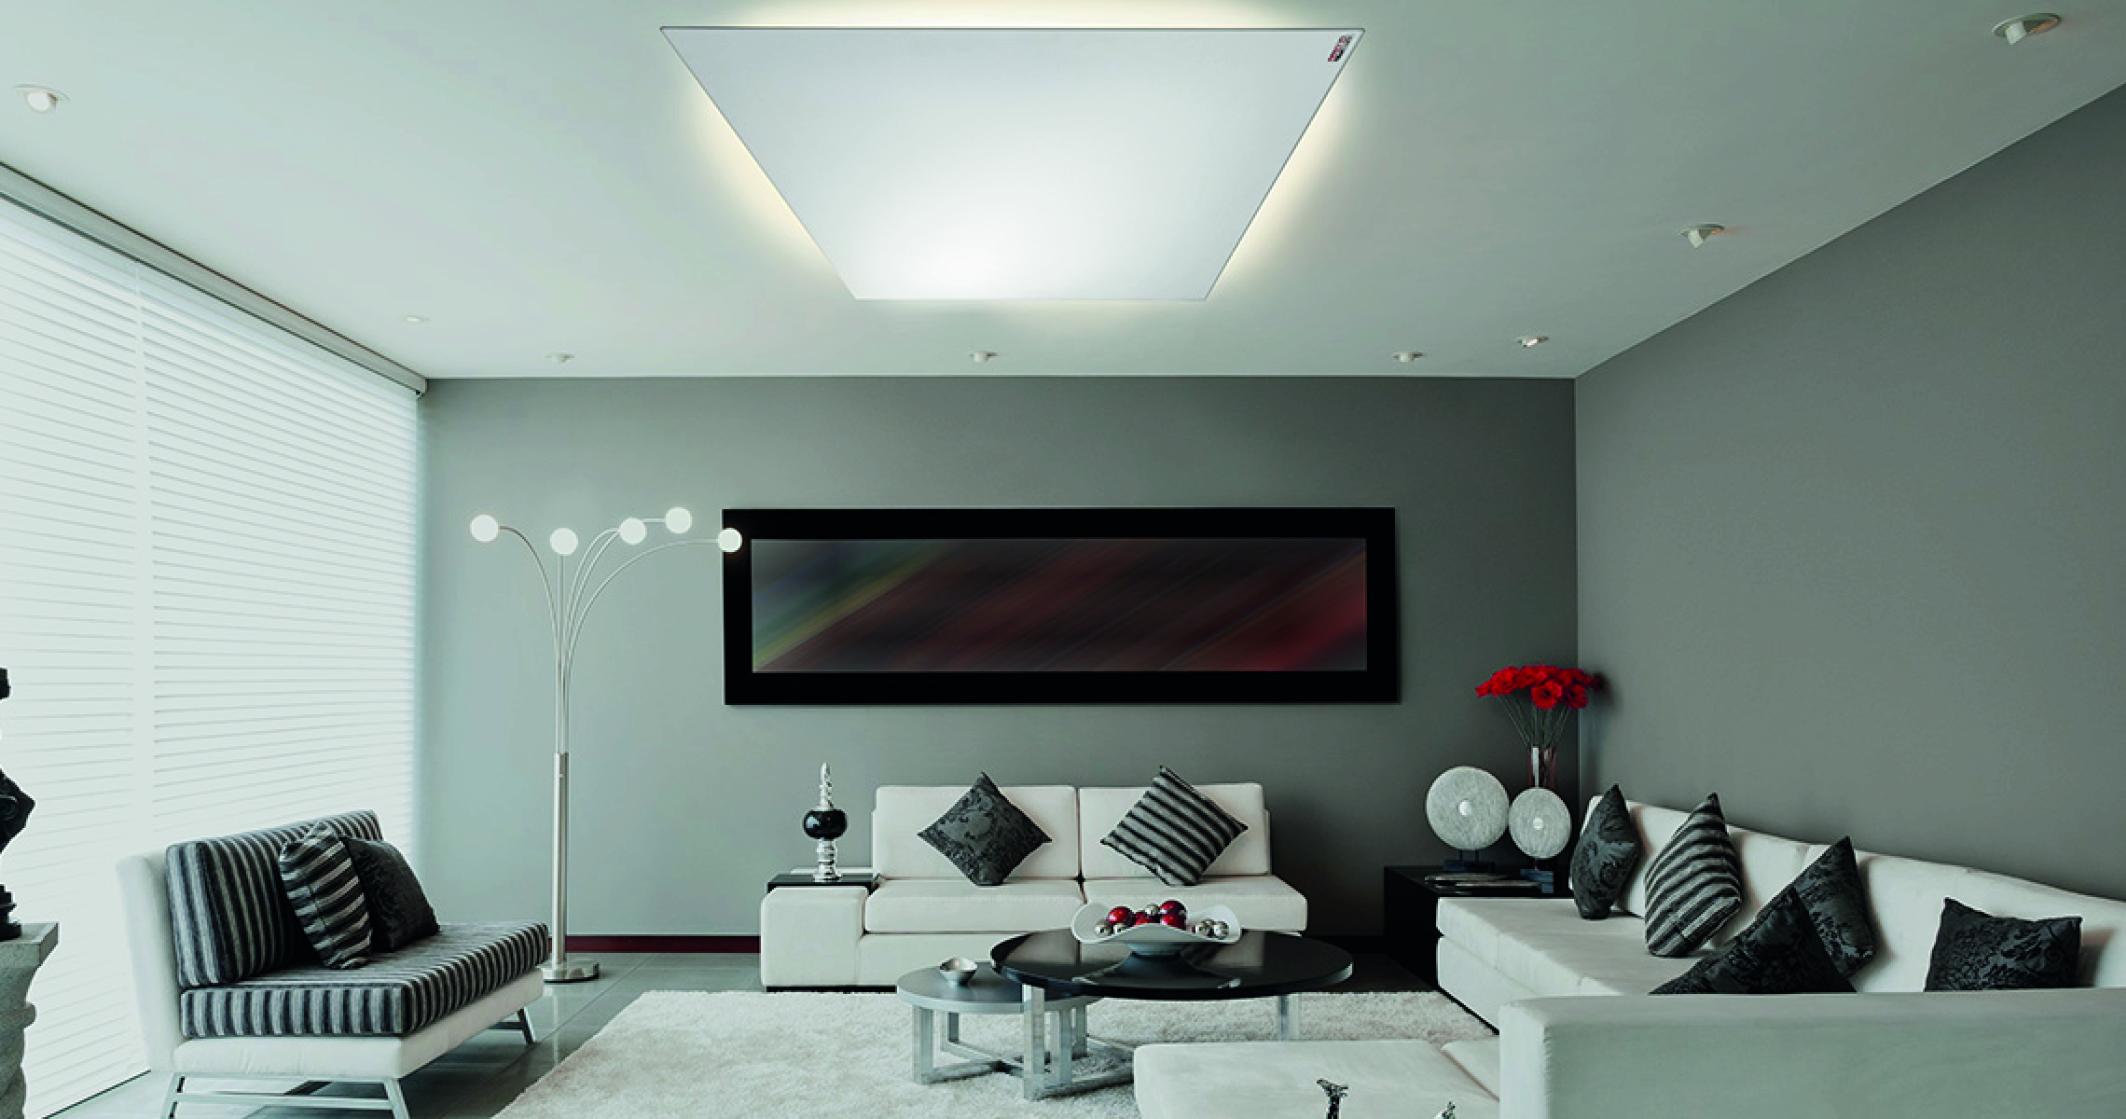 heizen mit infrarot best brast isp with heizen mit infrarot latest heizen mit infarot with. Black Bedroom Furniture Sets. Home Design Ideas